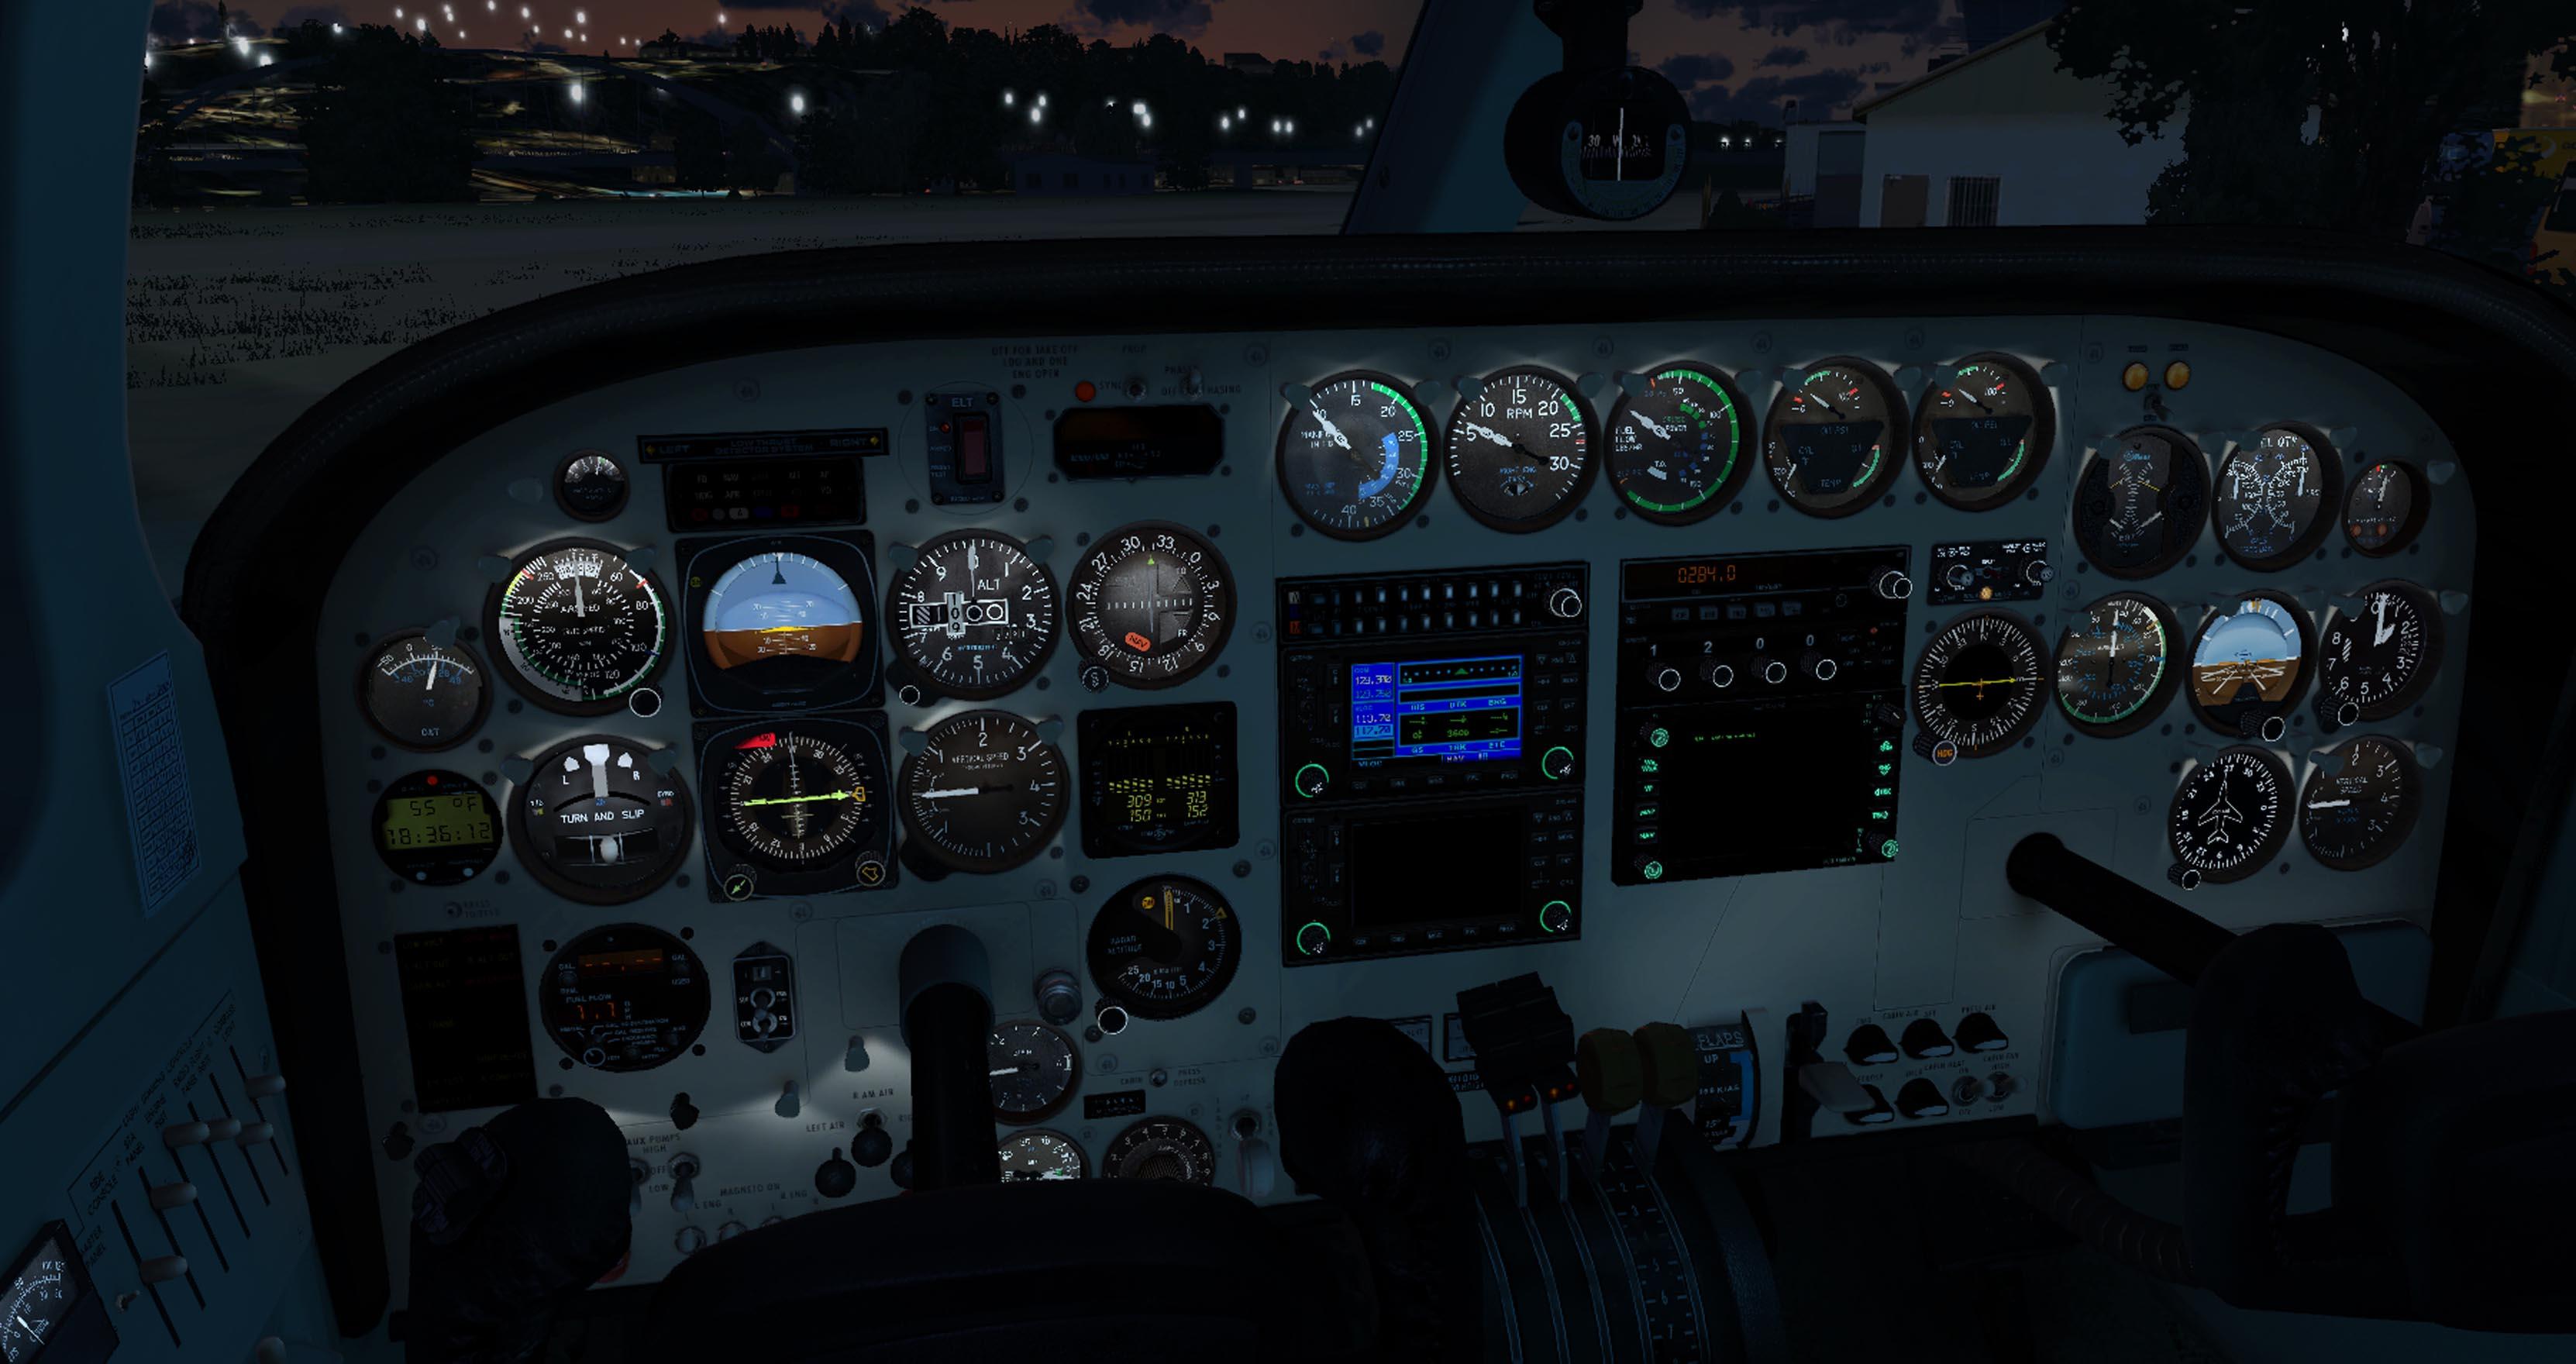 Nachtbeleuchtung